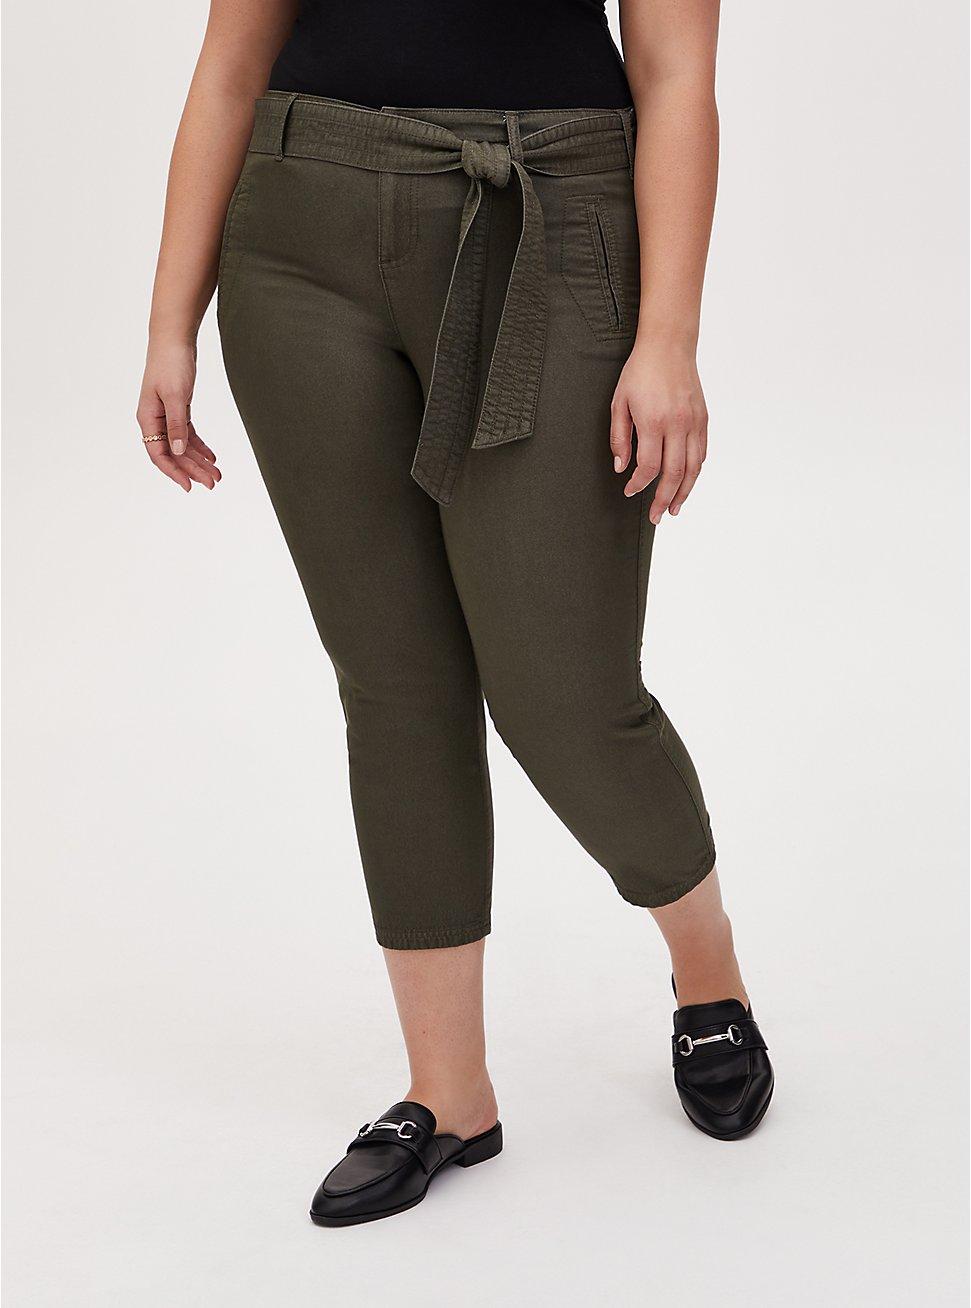 Crop Self Tie Utility Pant - Twill Olive Green, DEEP DEPTHS, hi-res